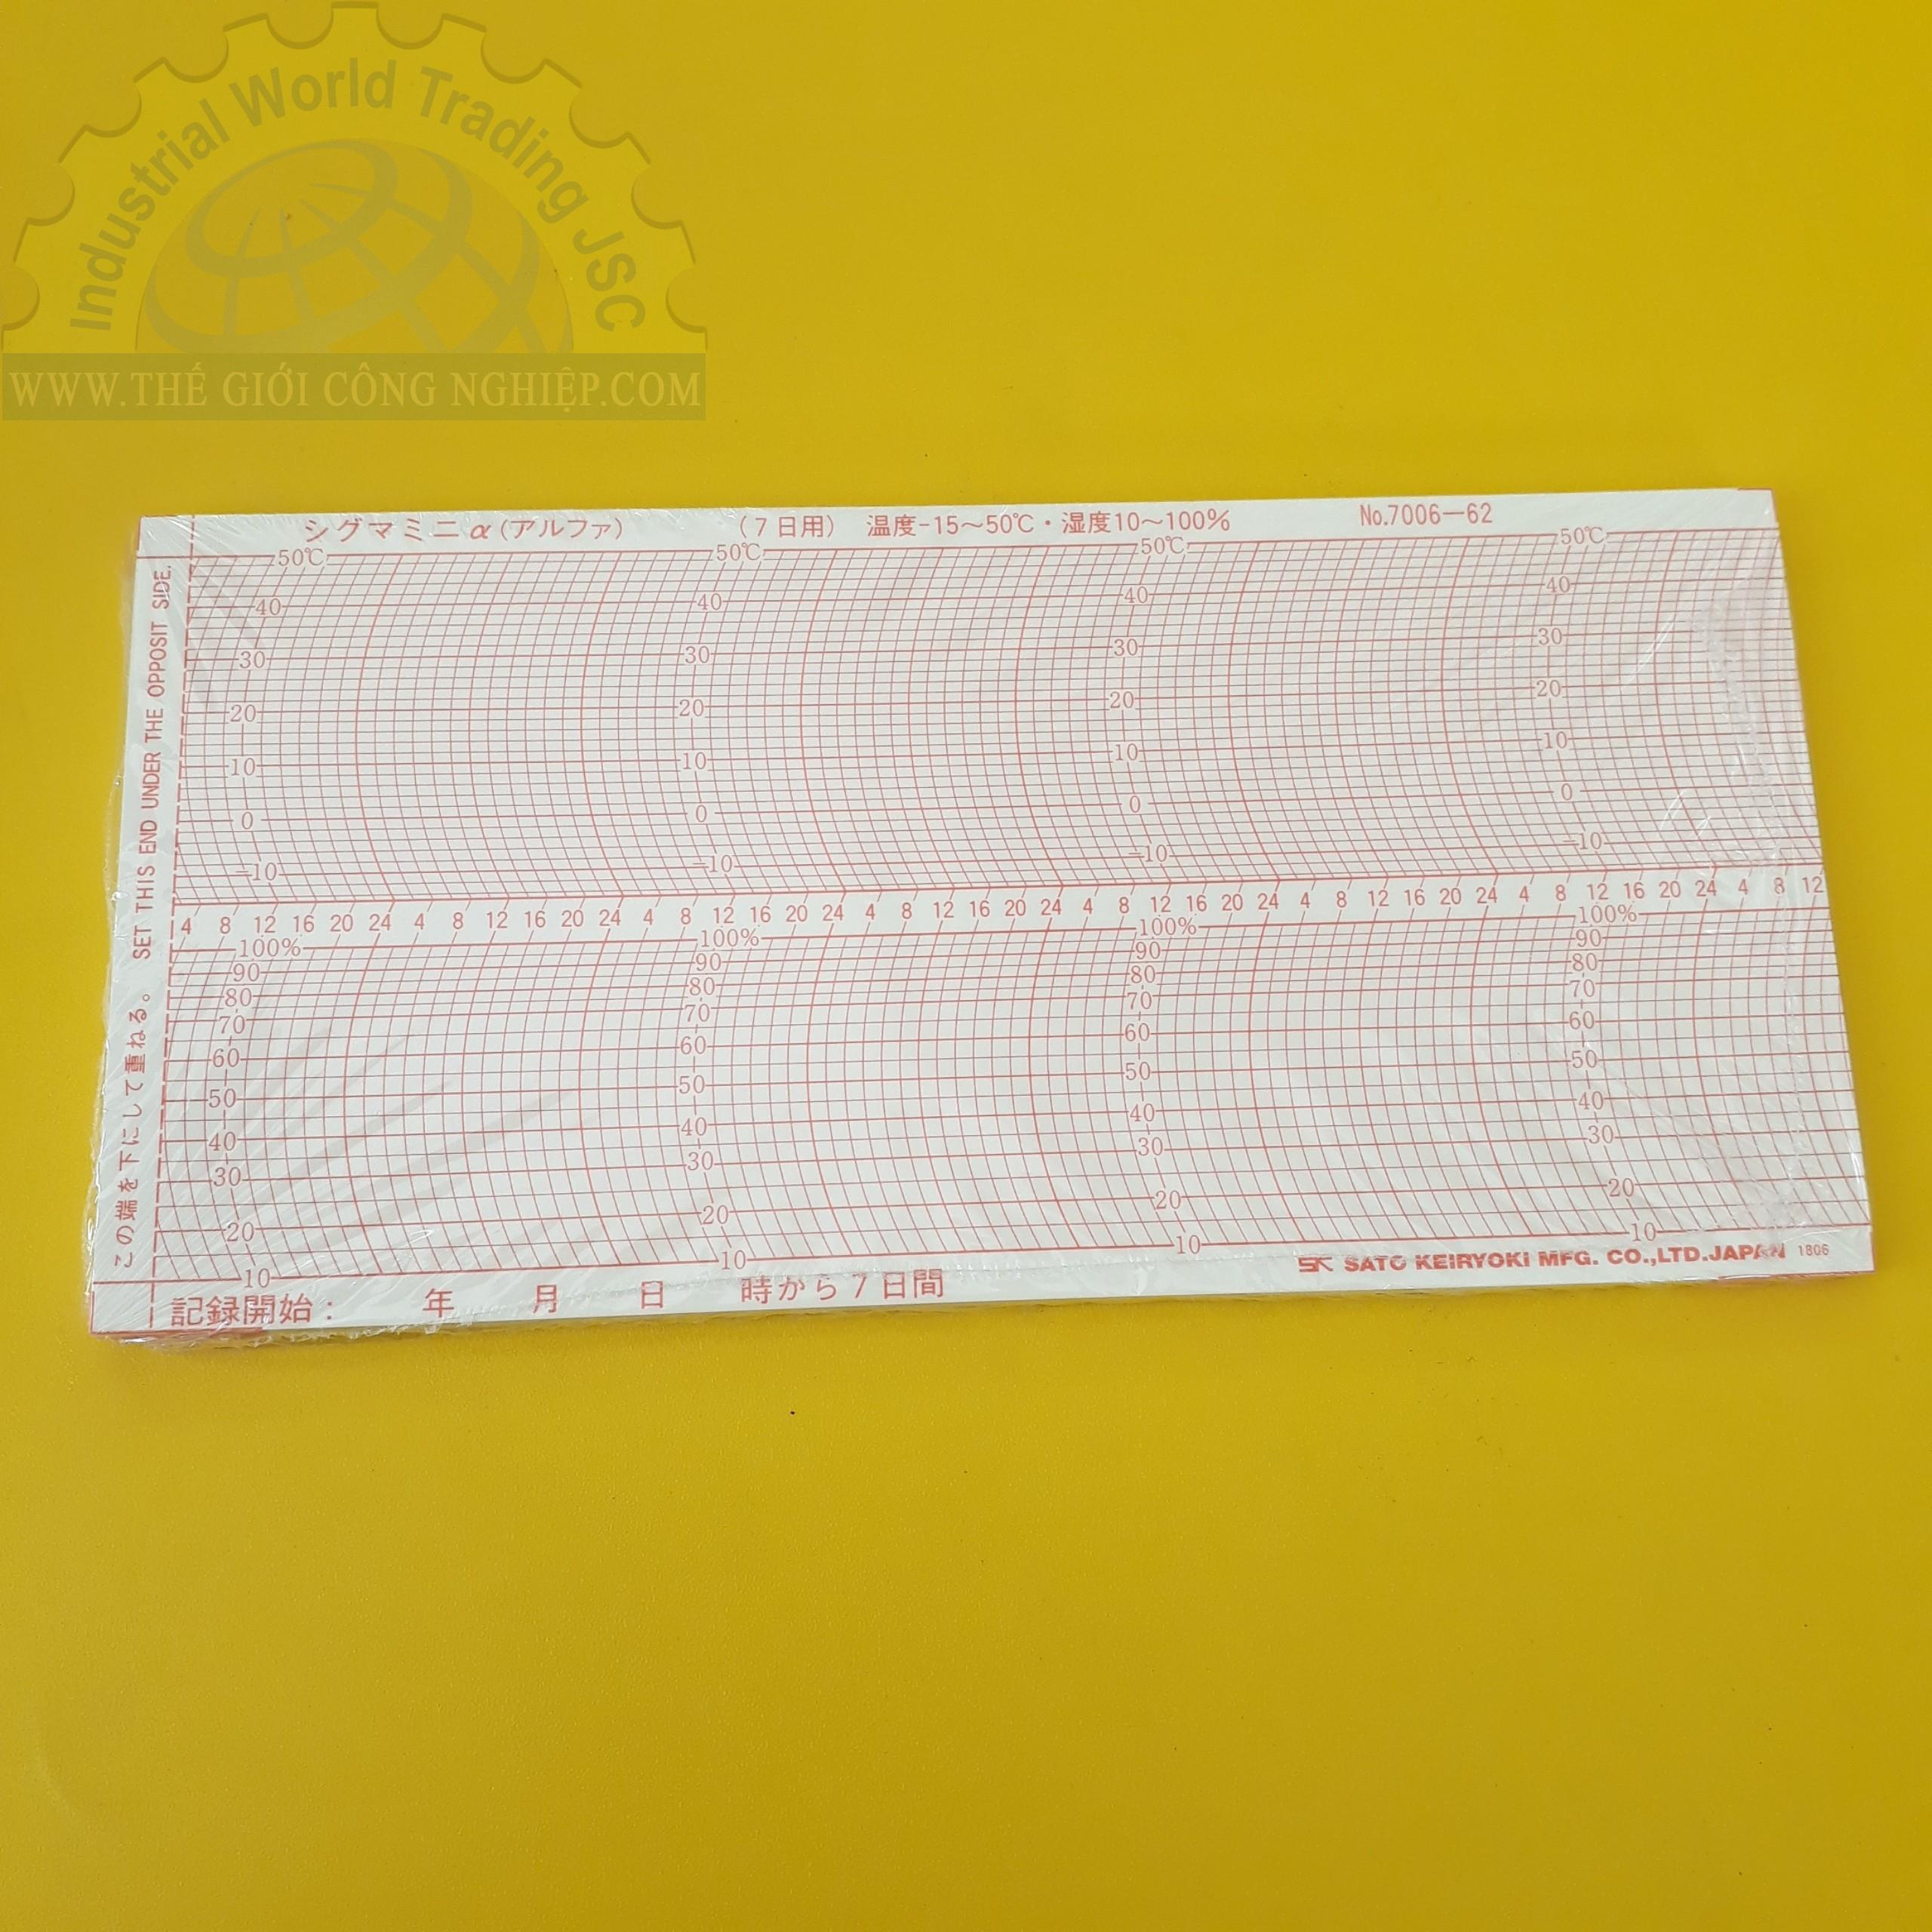 Giấy ghi nhiệt 7 ngày chart for Mini α Thermohygrographs 7006-62 SATO